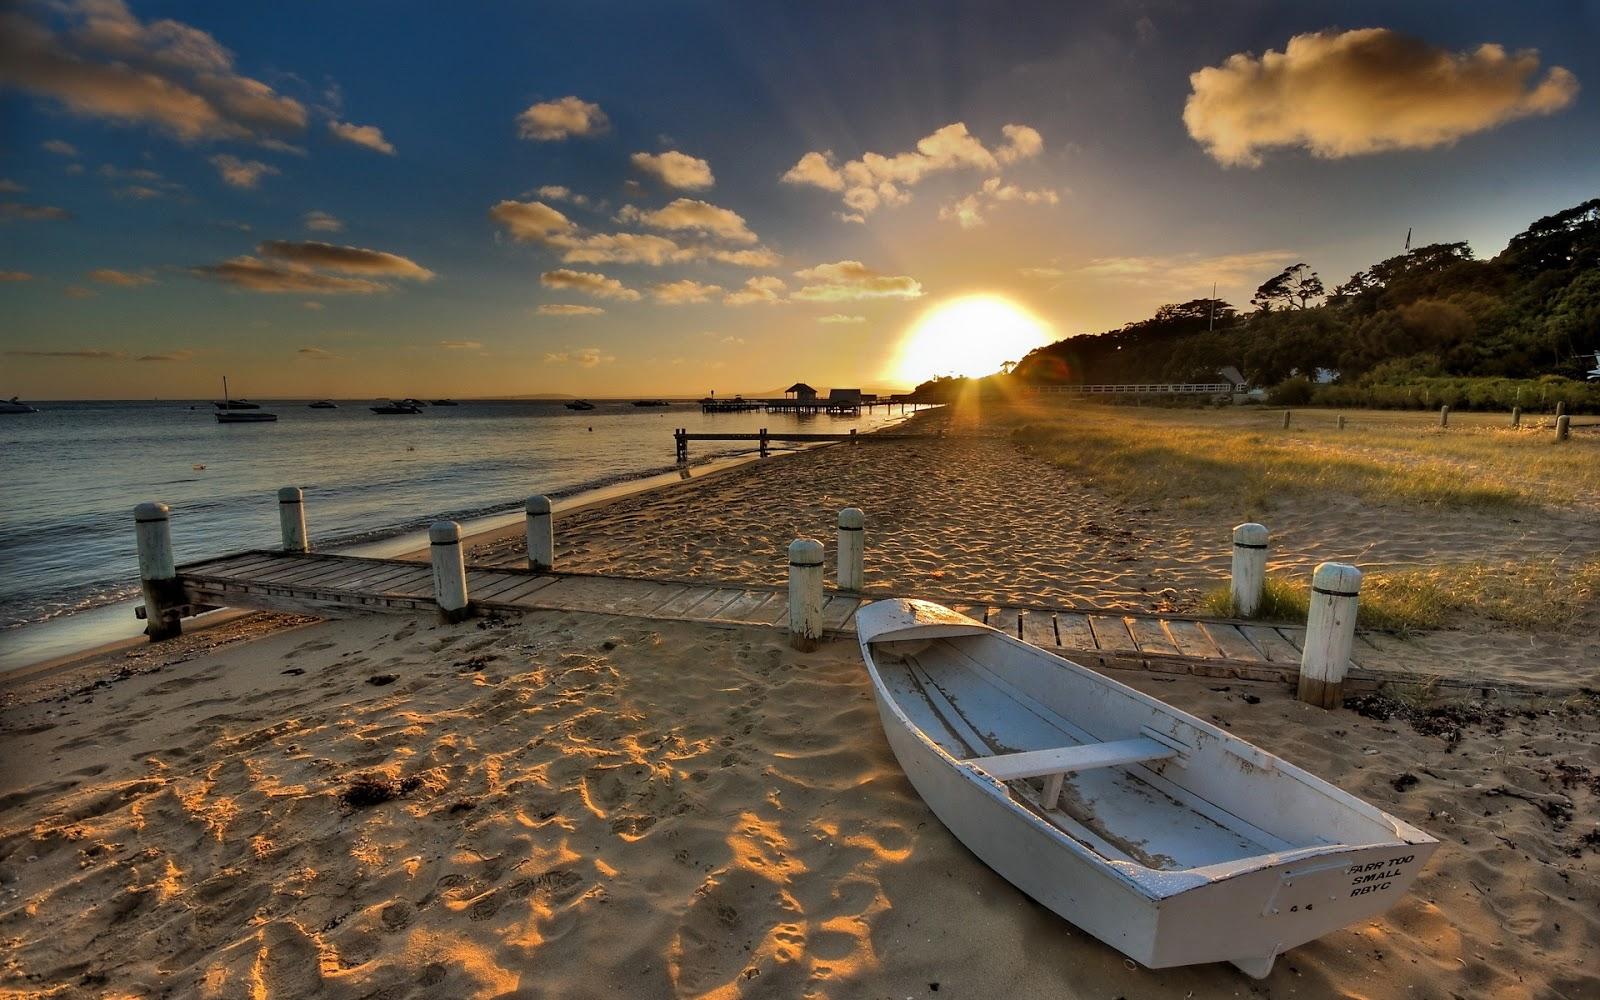 Hd wallpapers desktop wallpapers 1080p beach boat - Beach hd wallpapers 1080p ...